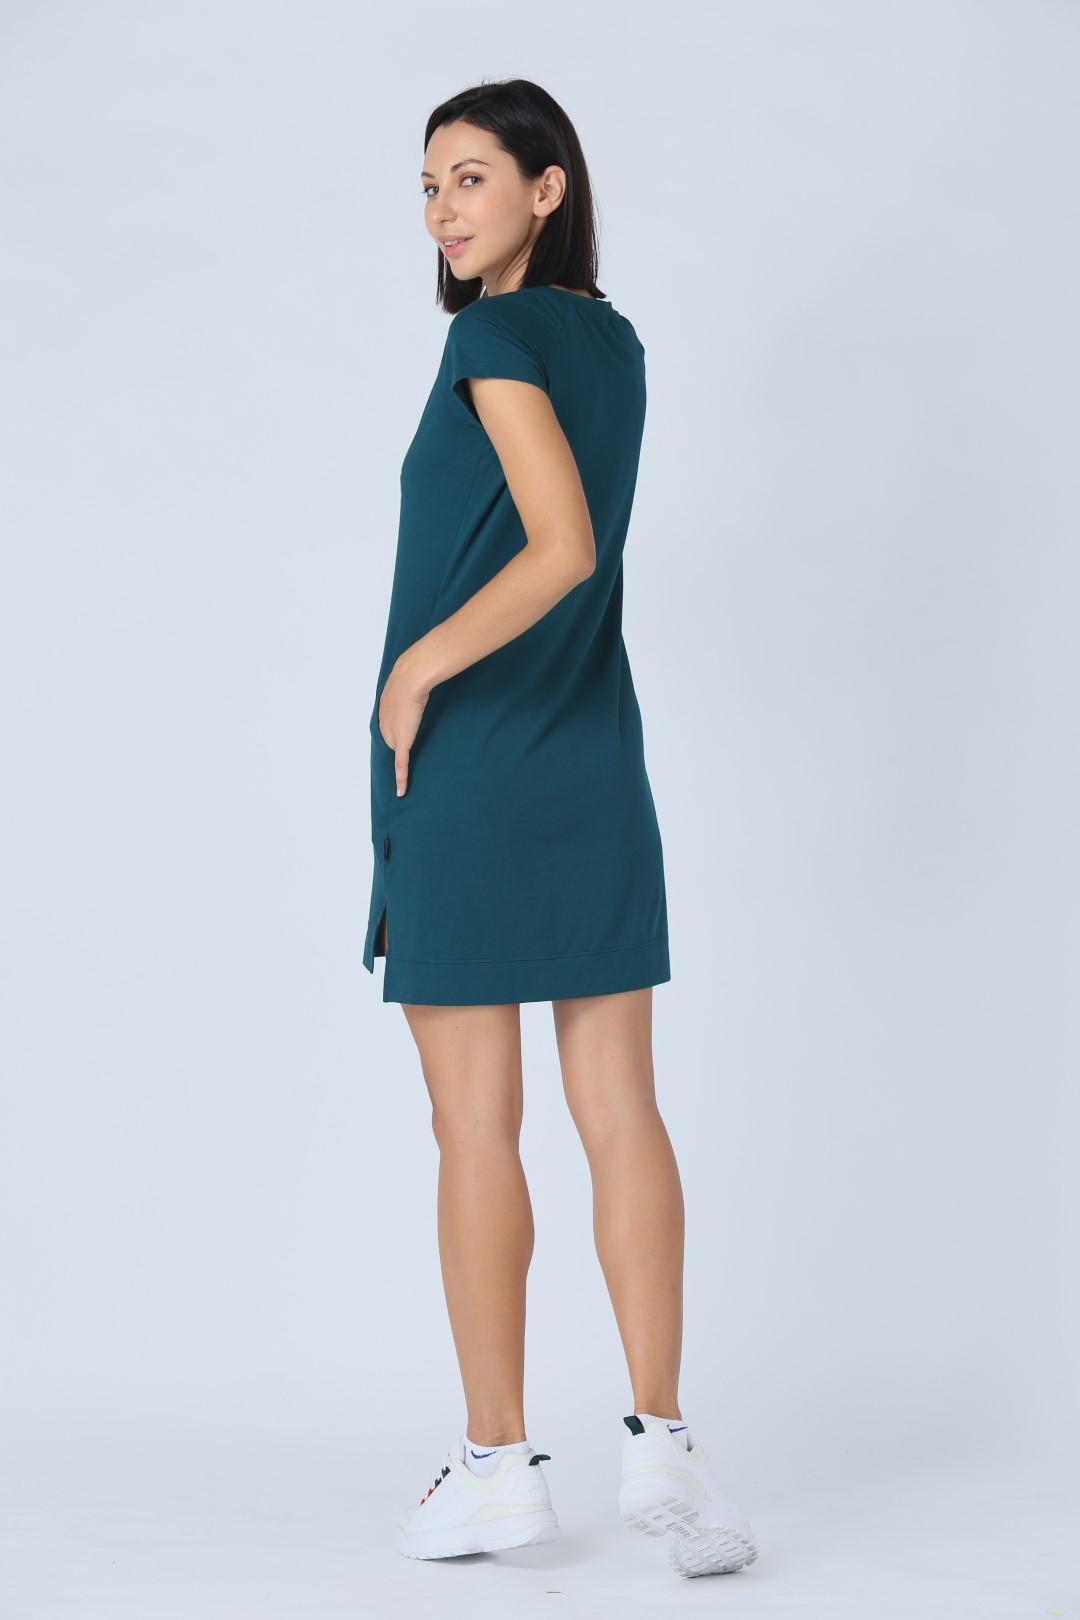 Đầm thun nữ Jockey Bamboo - 0429